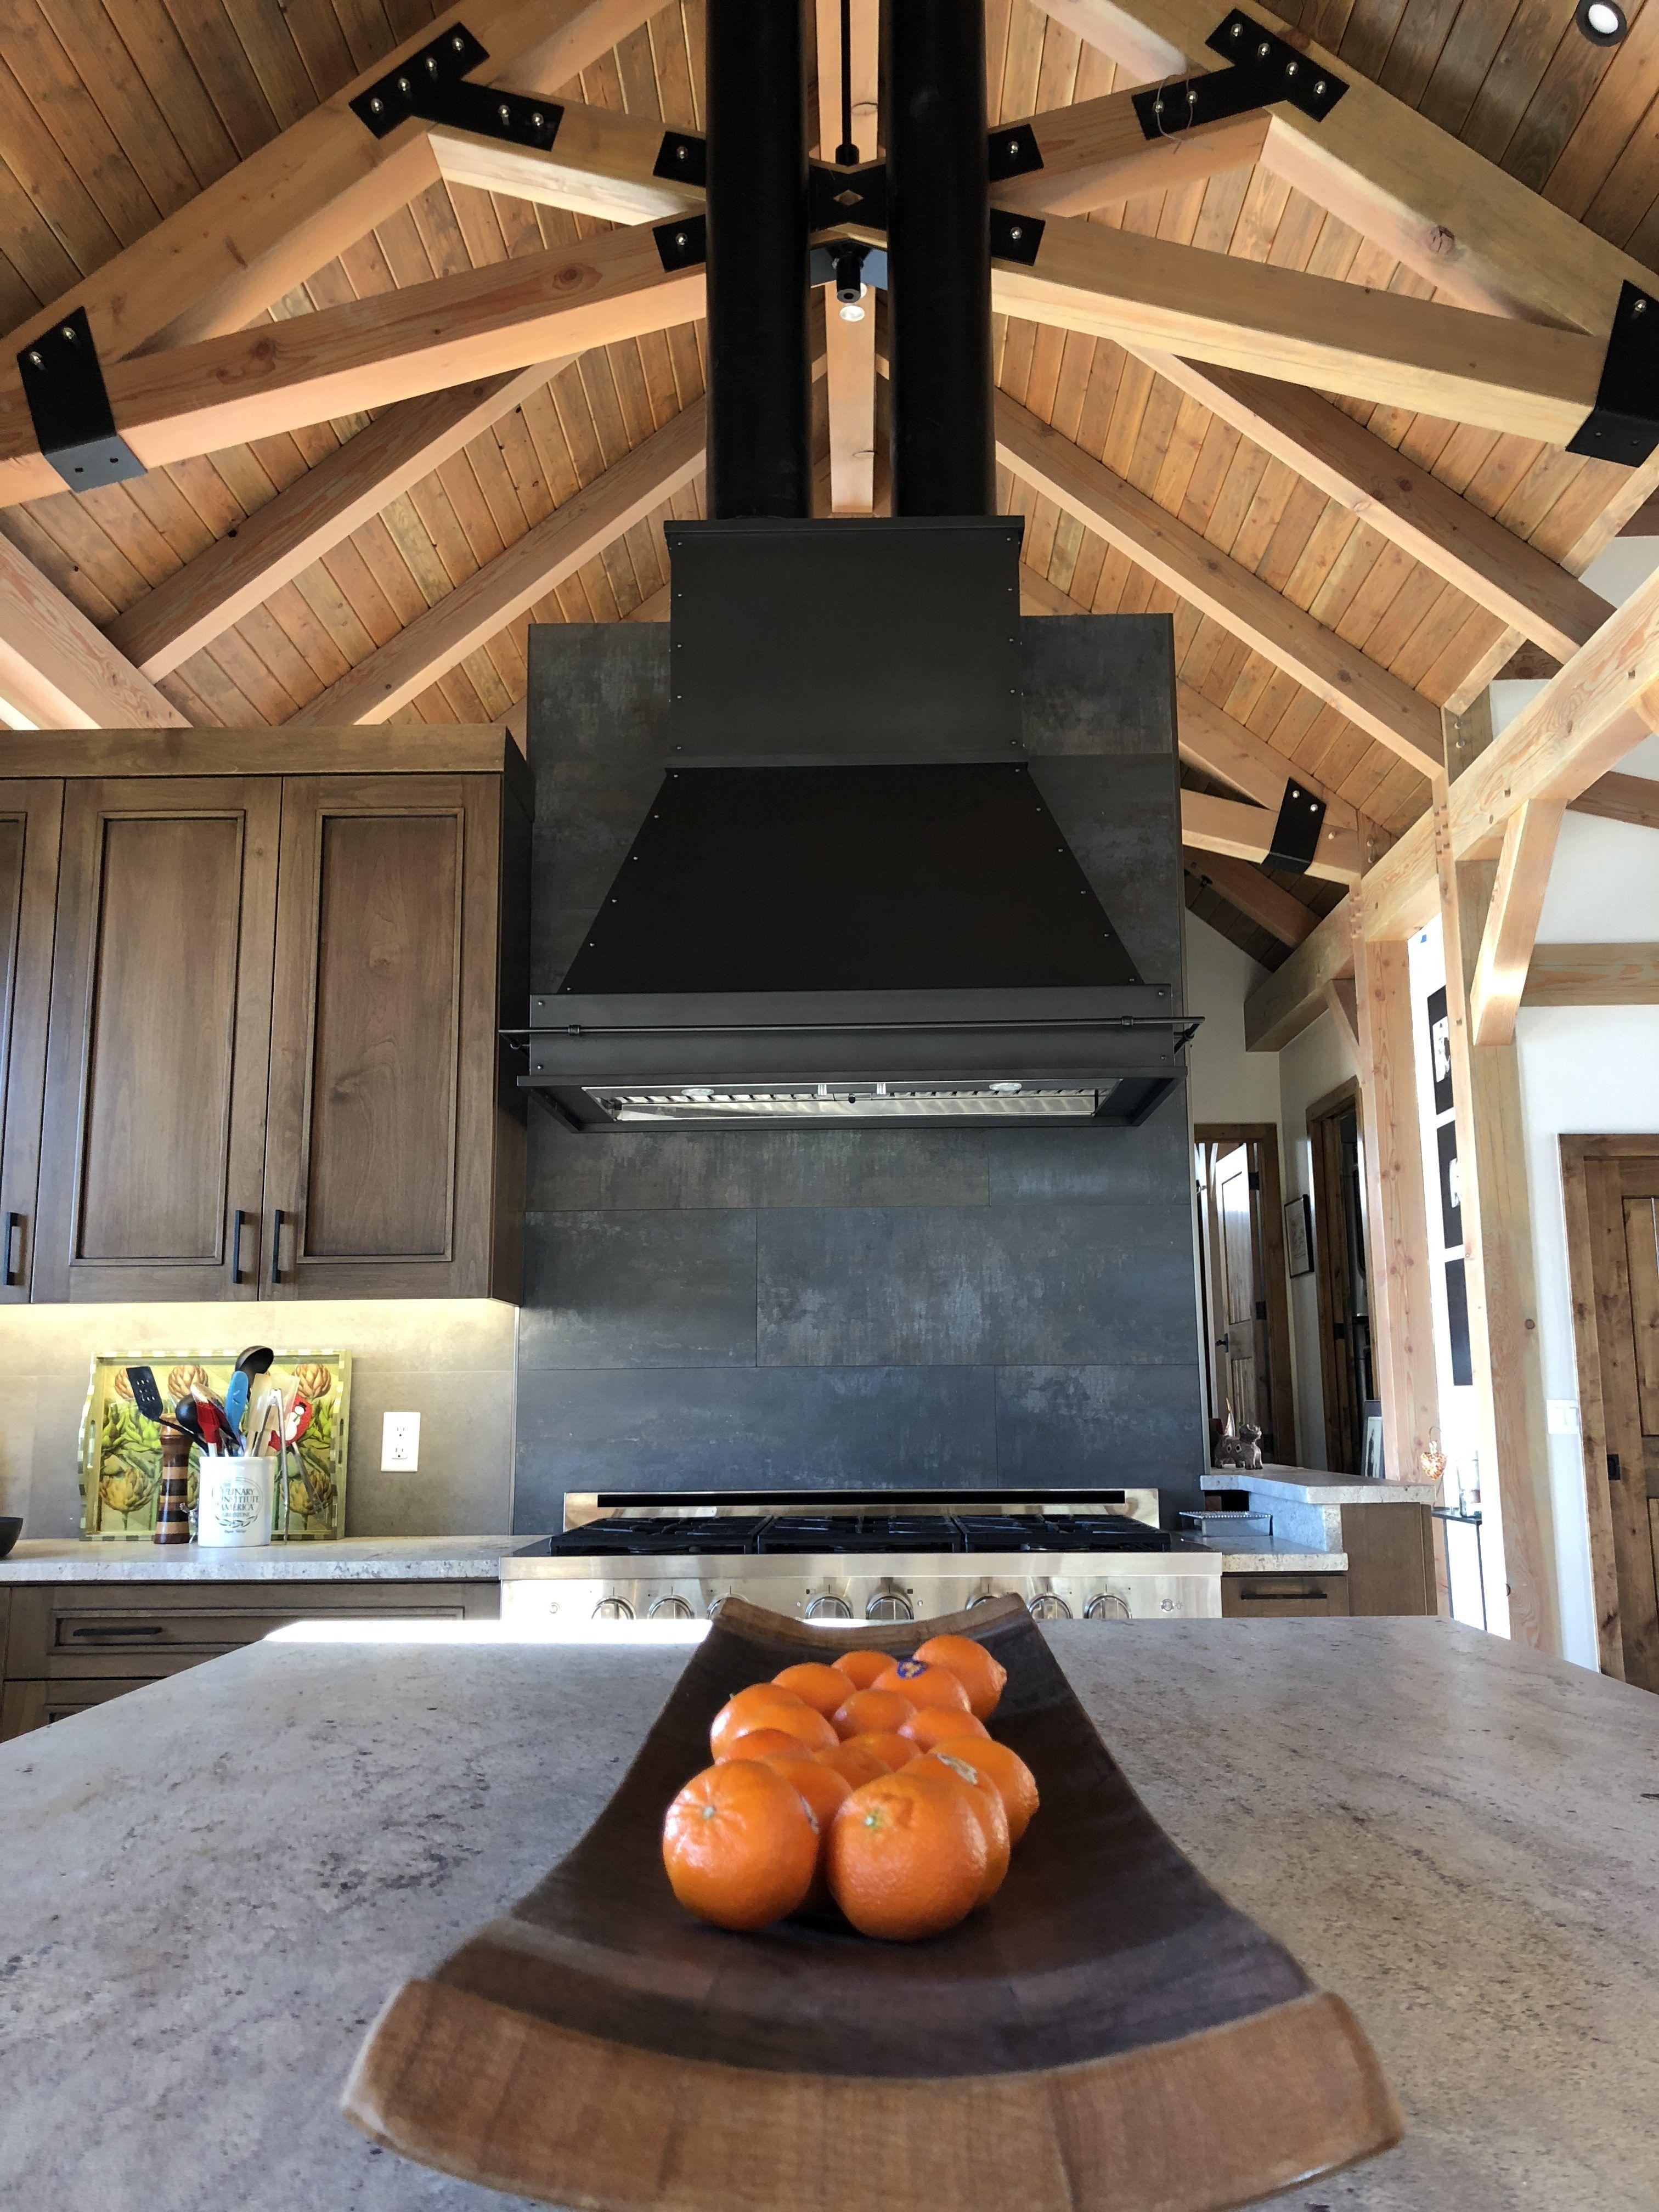 creede range hood in blackened steel patina by raw urth designs range hoods kitchen vent hood on outdoor kitchen vent hood ideas id=65029